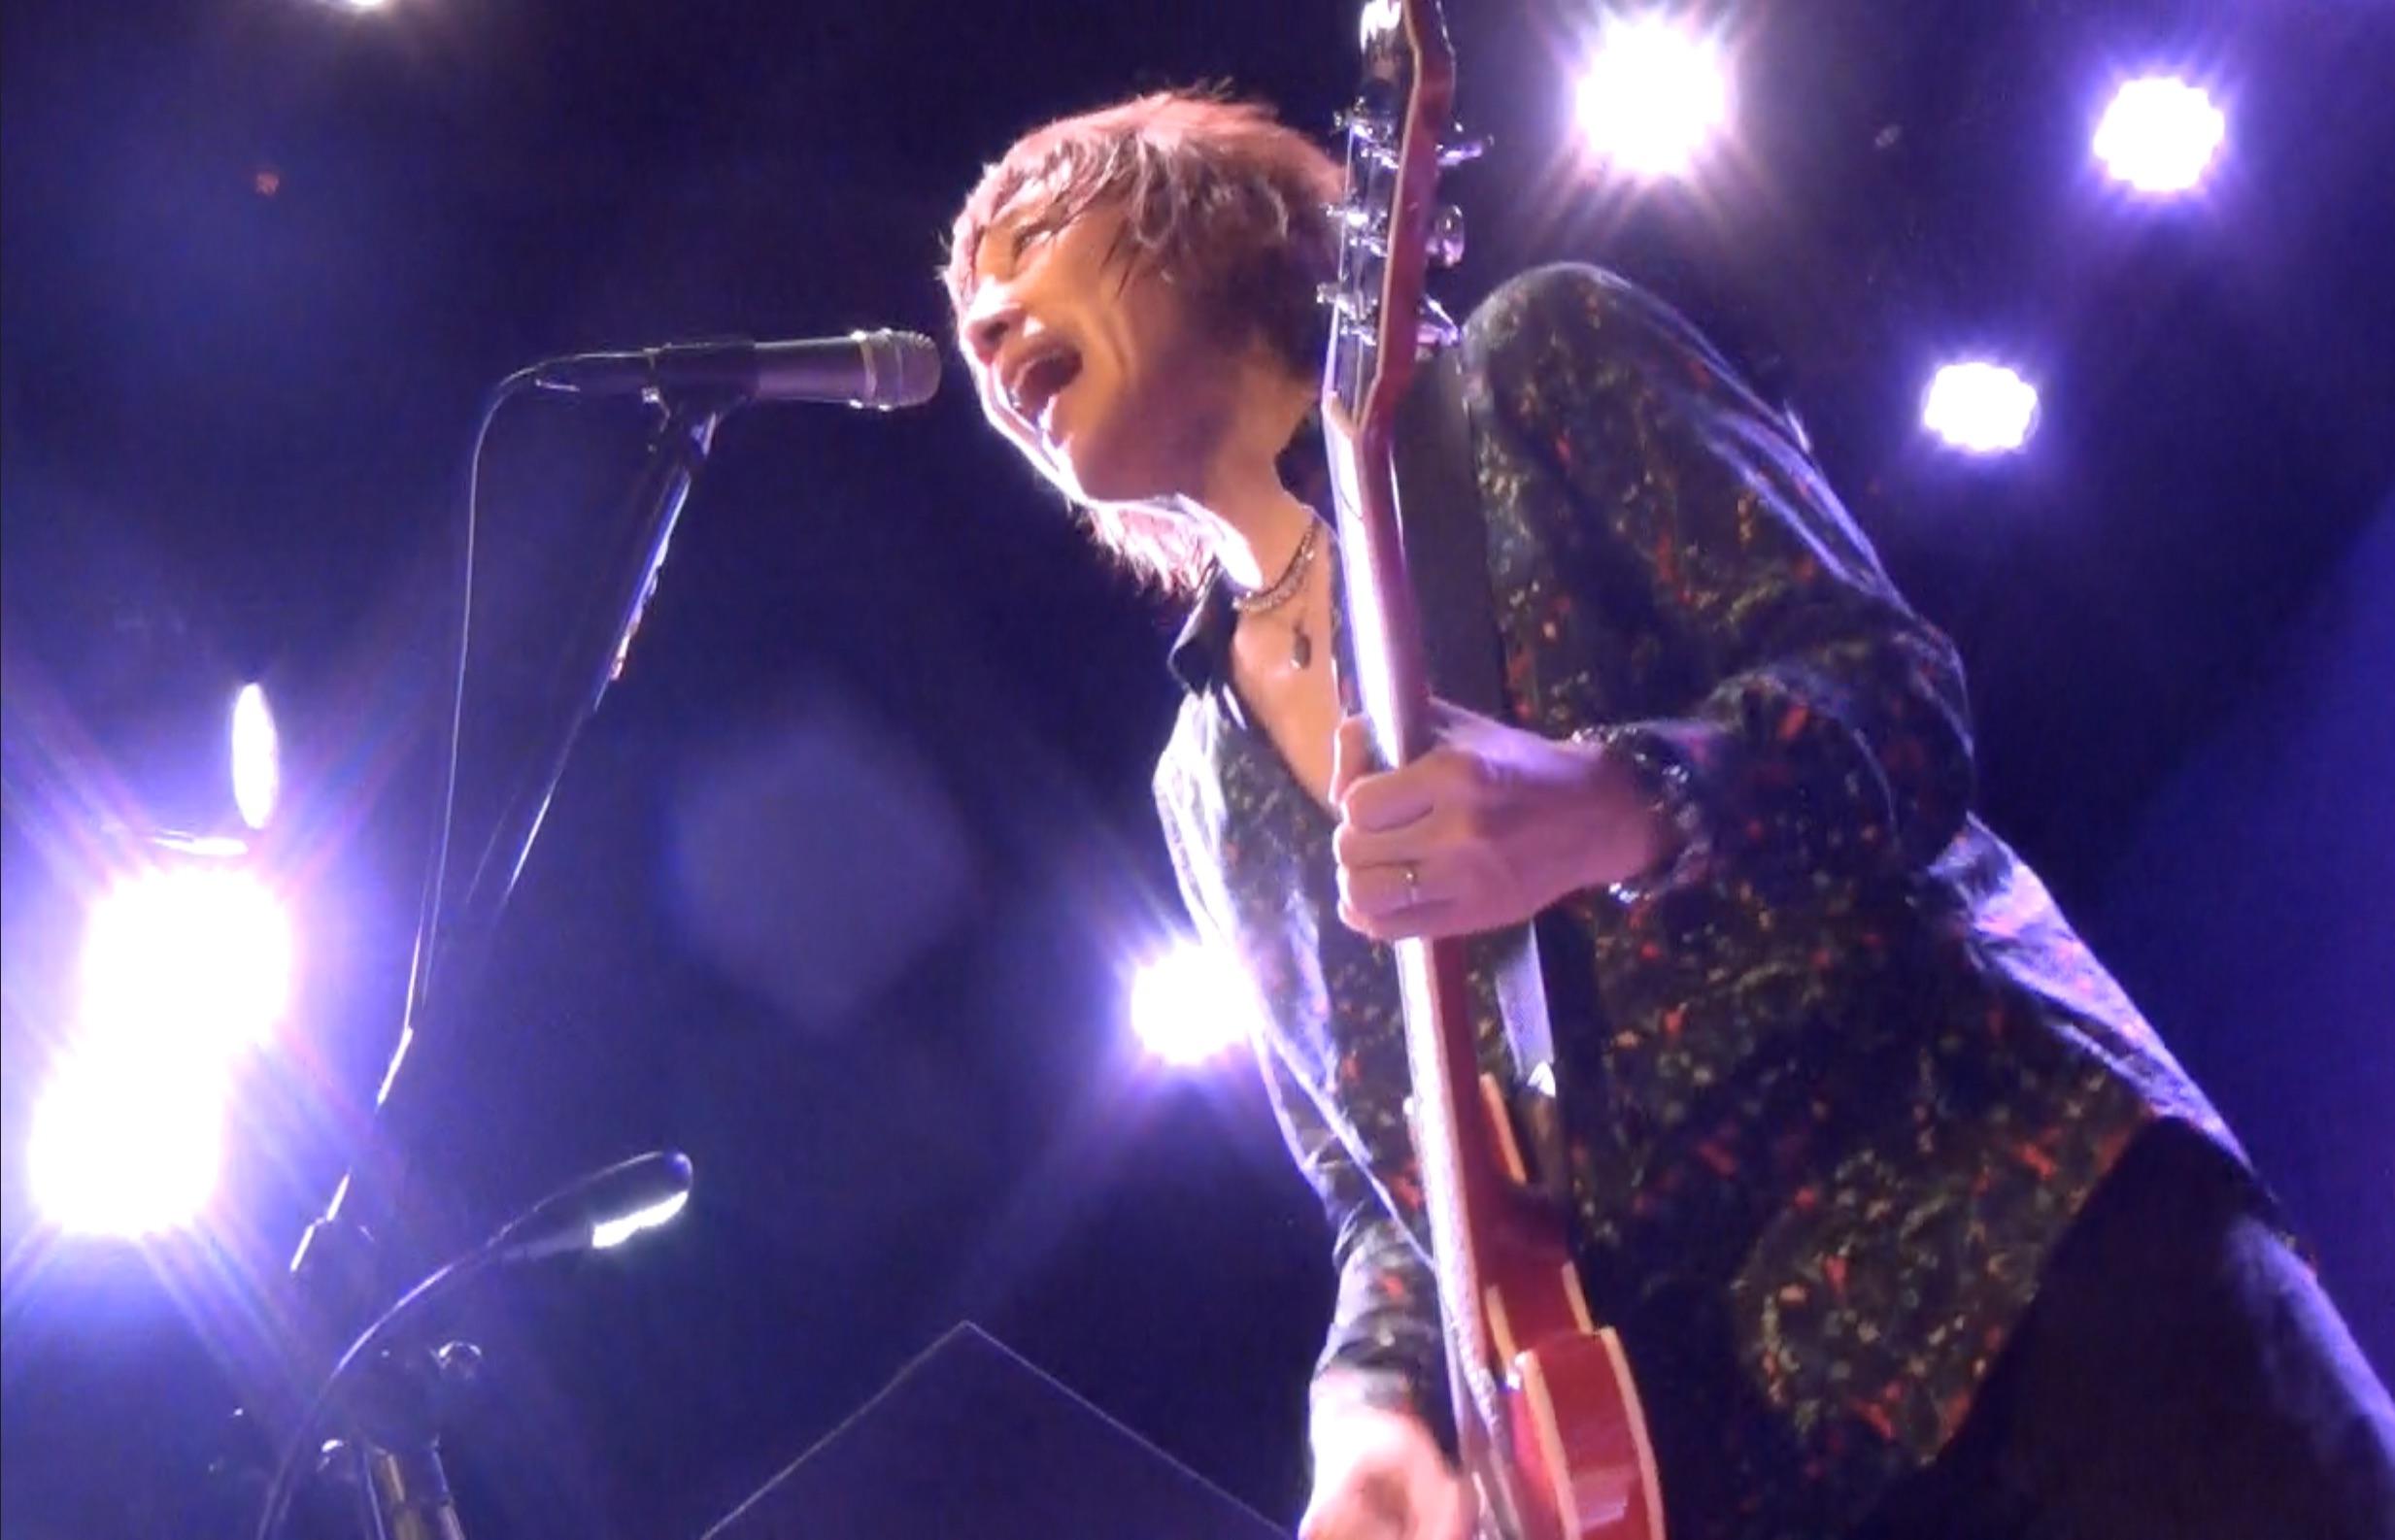 TAKASHI O'HASHI 2020 Solo Live Action 55-55 Special Band Version